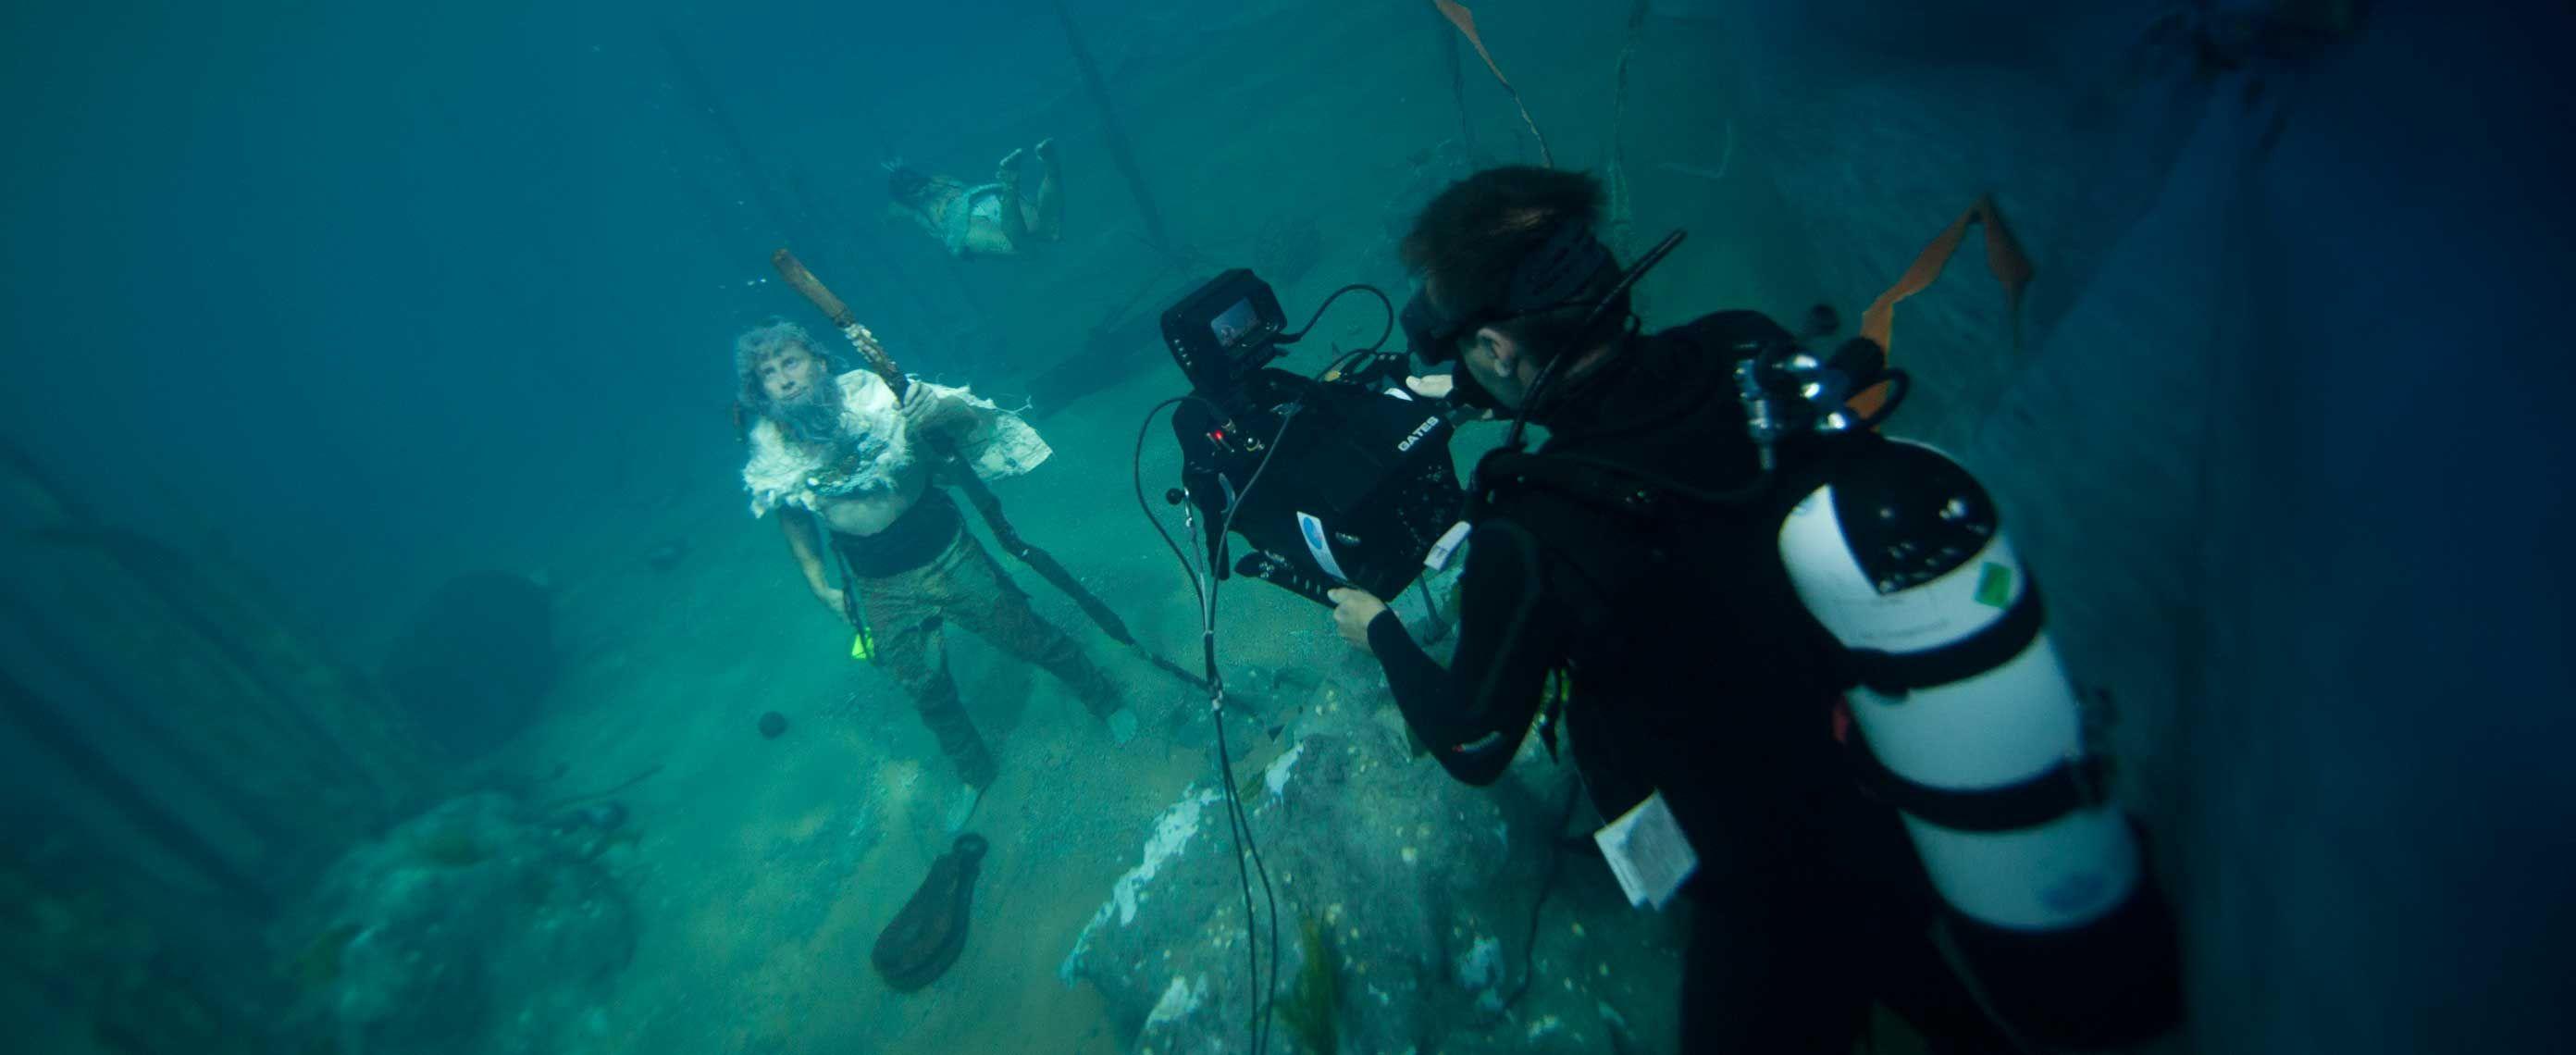 Underwater Filming Underwater, Fish pet, Photo